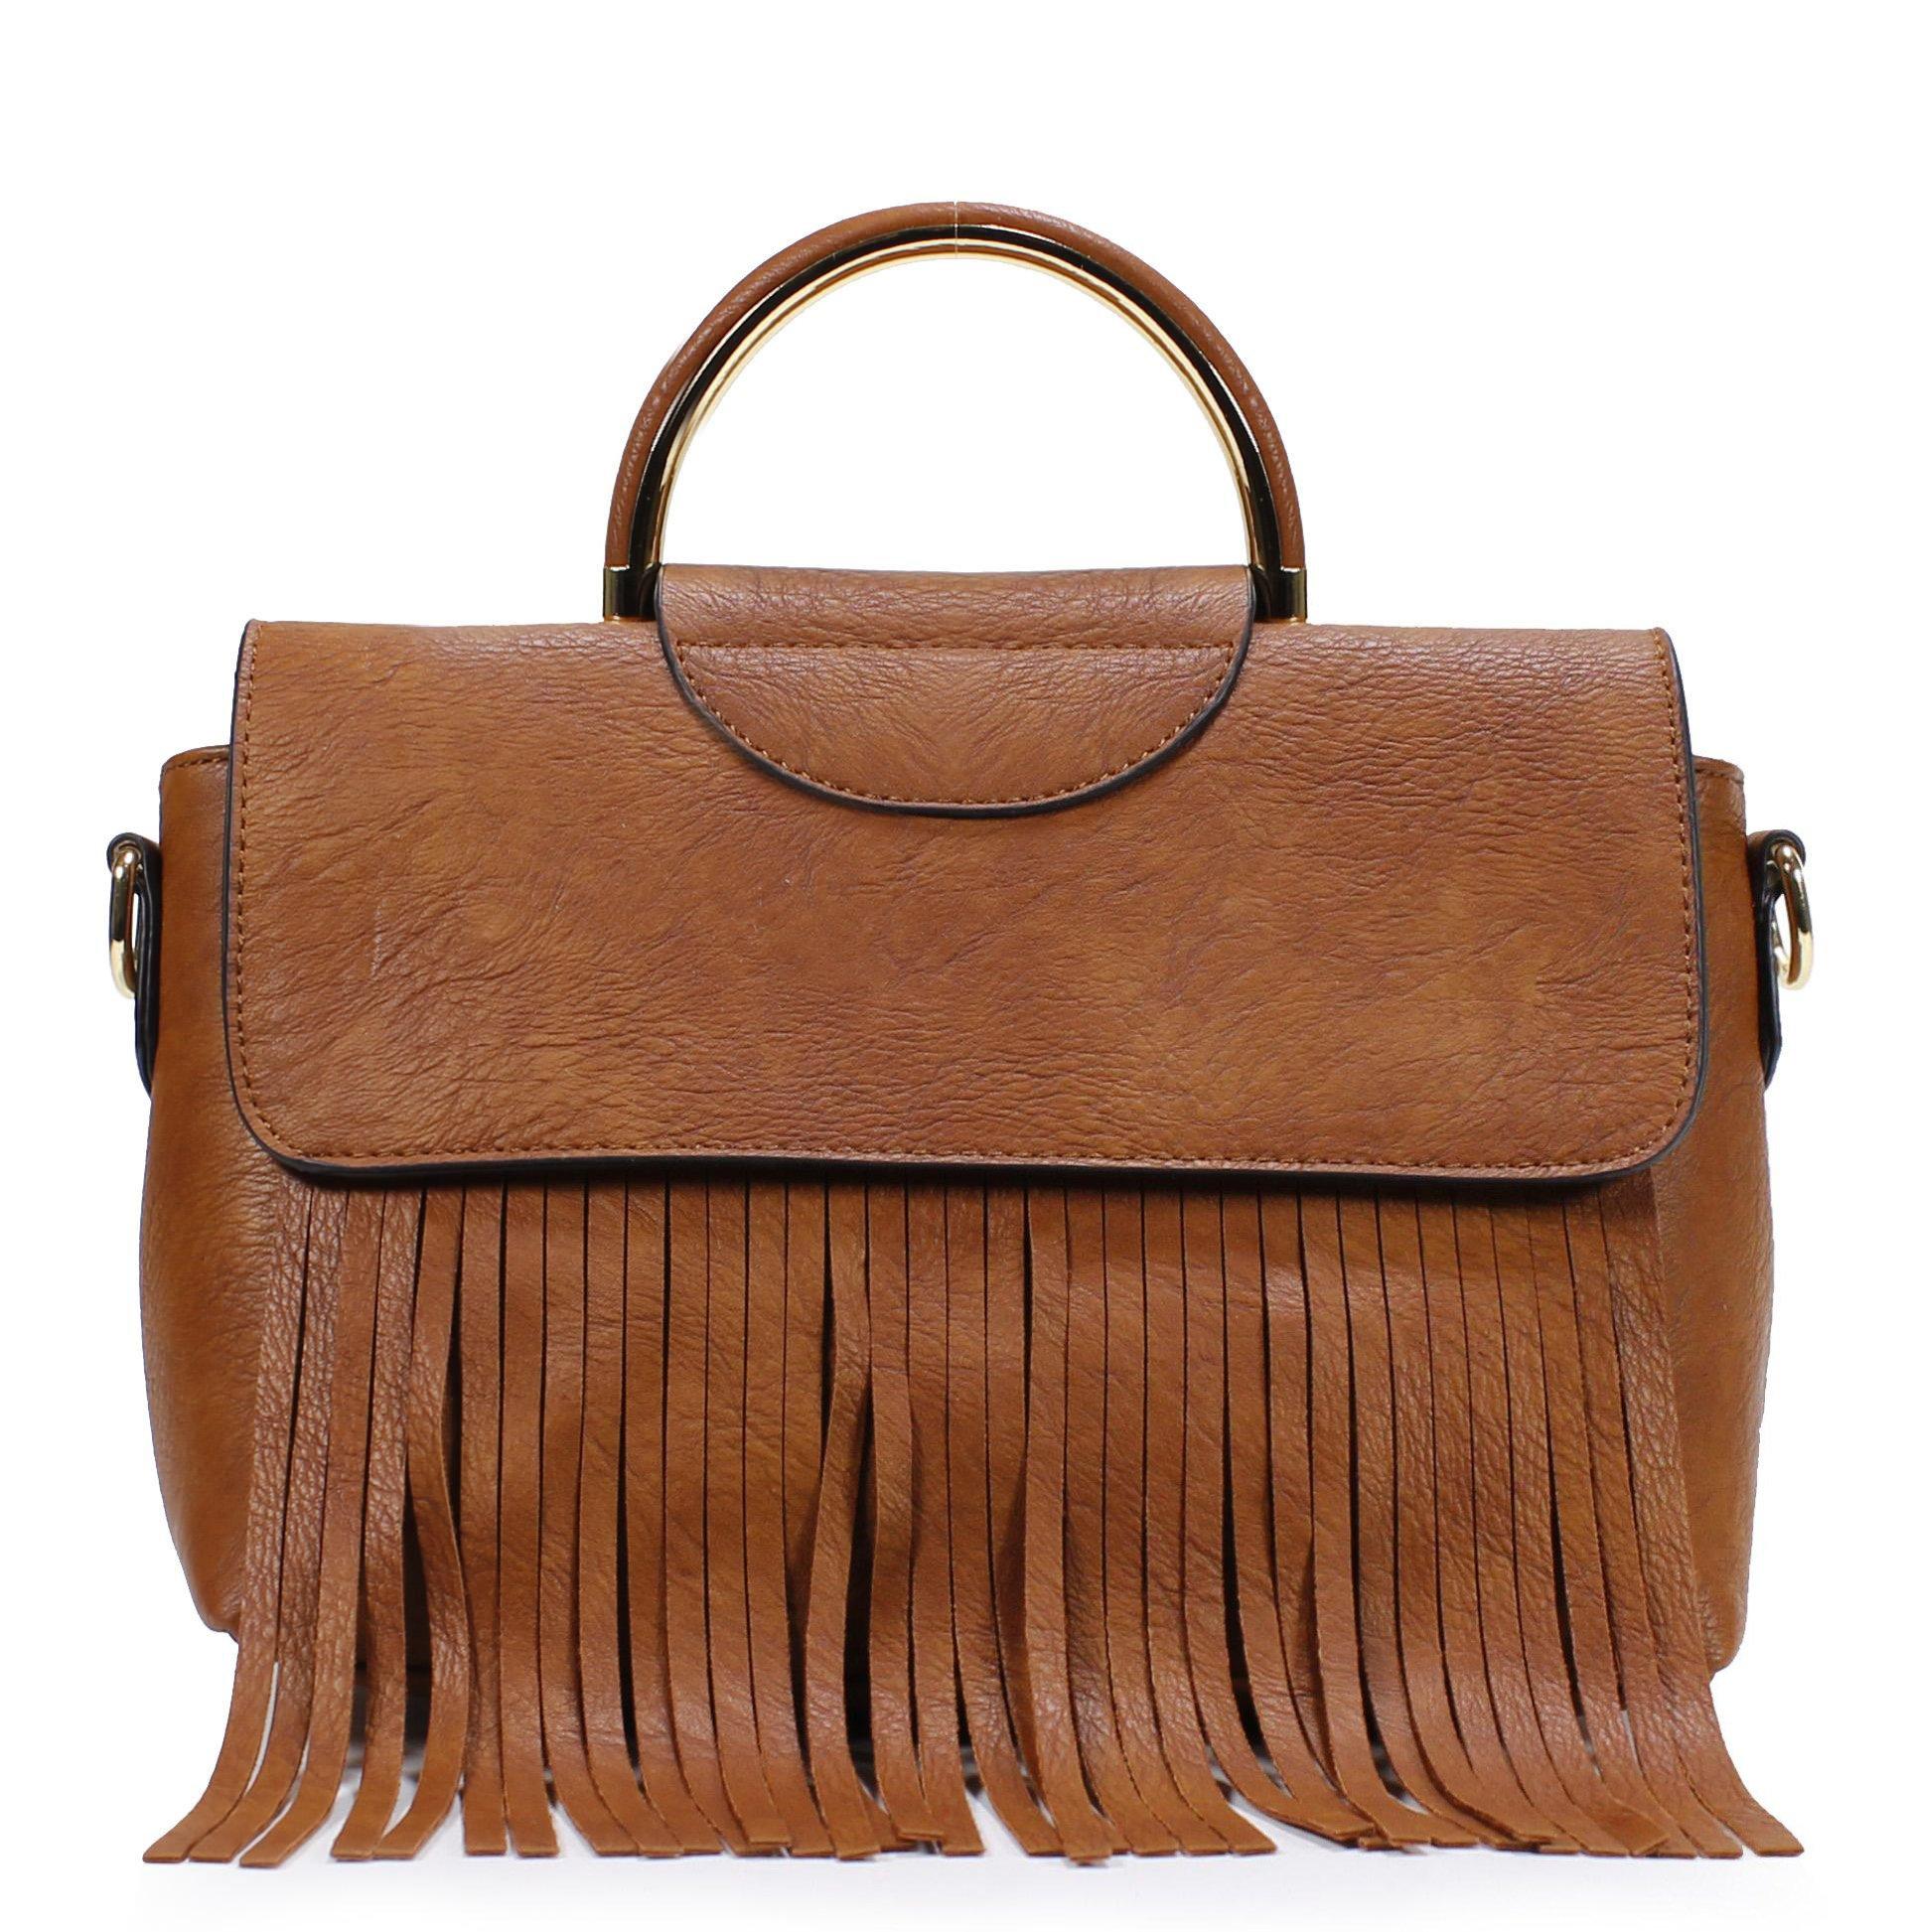 Scarleton Stylish Amerind Style Satchel H185804 - Brown